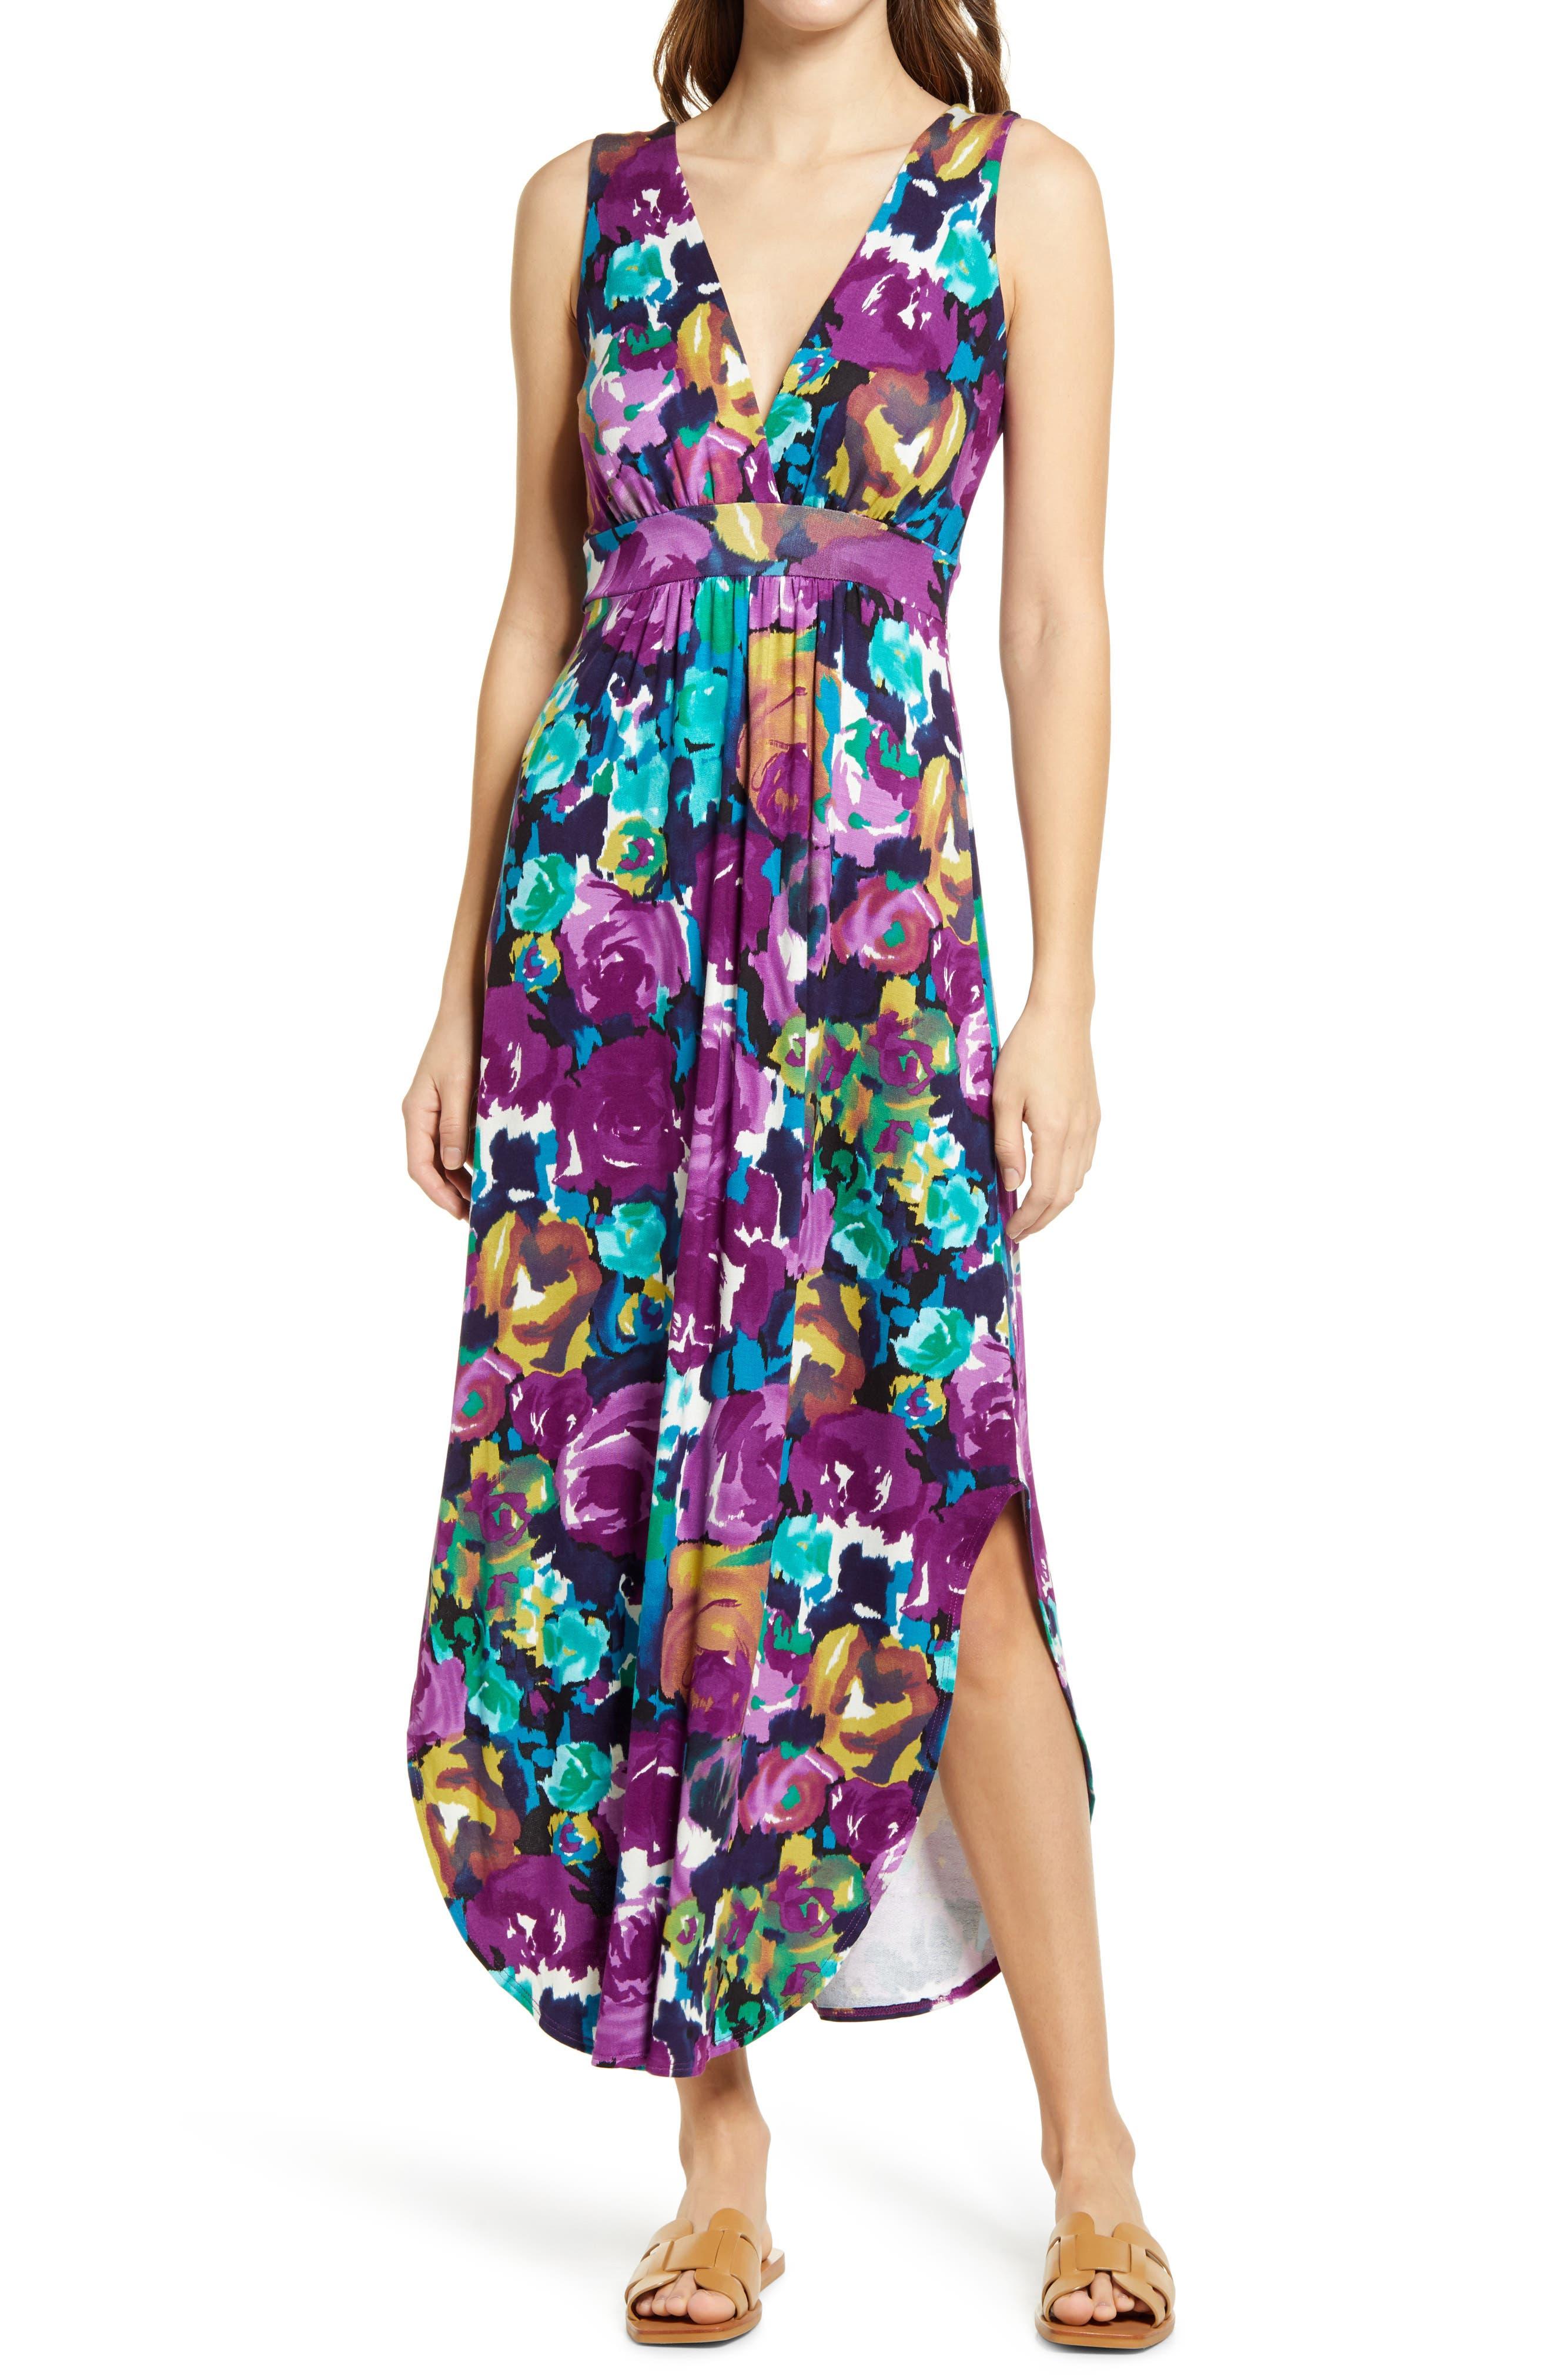 Anza Floral Print Sleeveless Dress